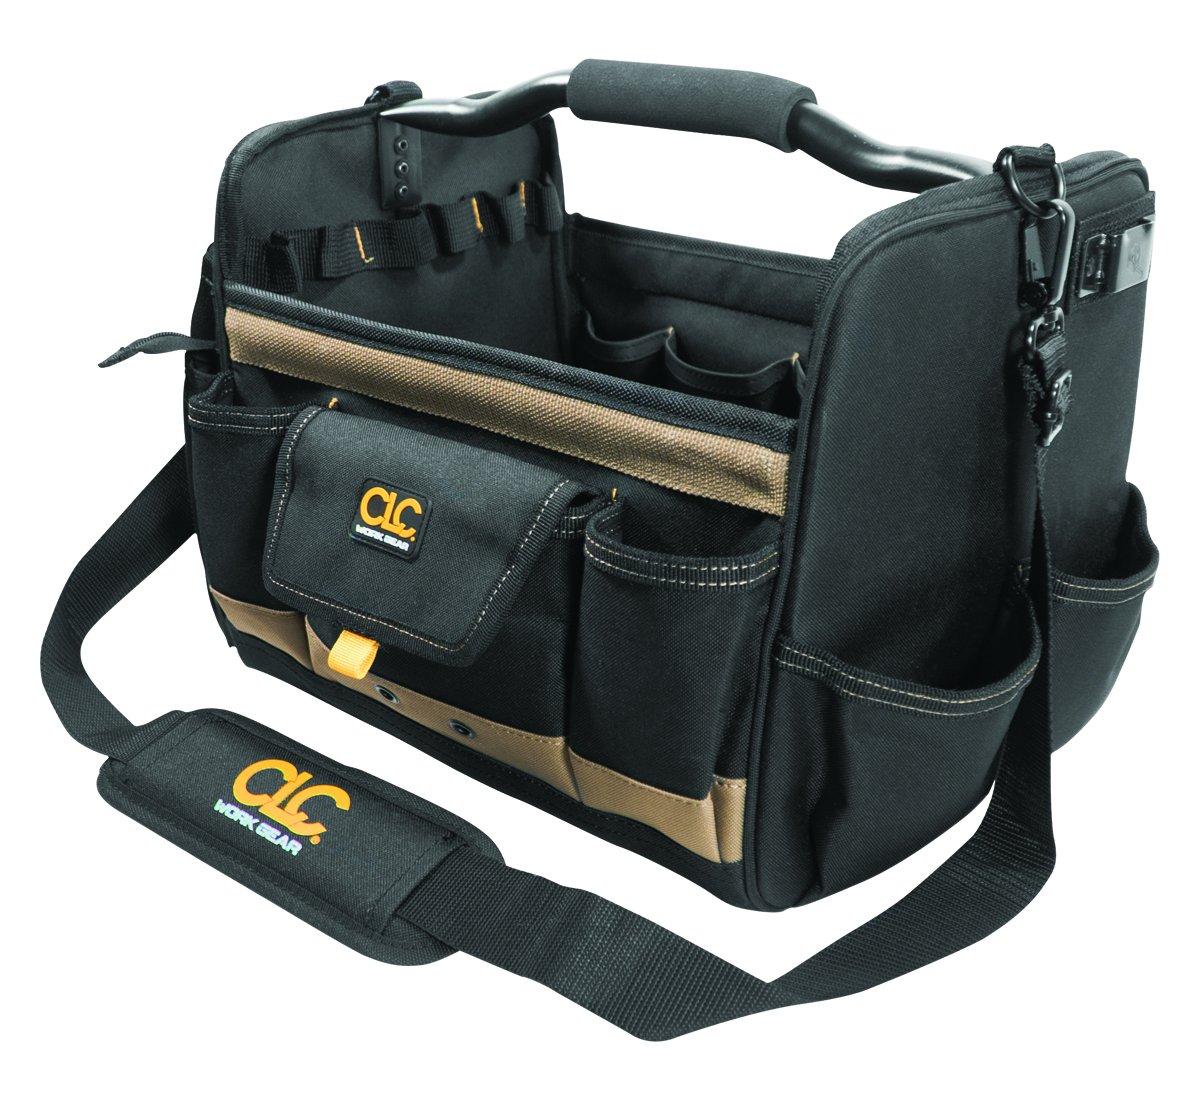 Custom LeatherCraft 1578 14-Inch Open-top Soft Sided Tool Box